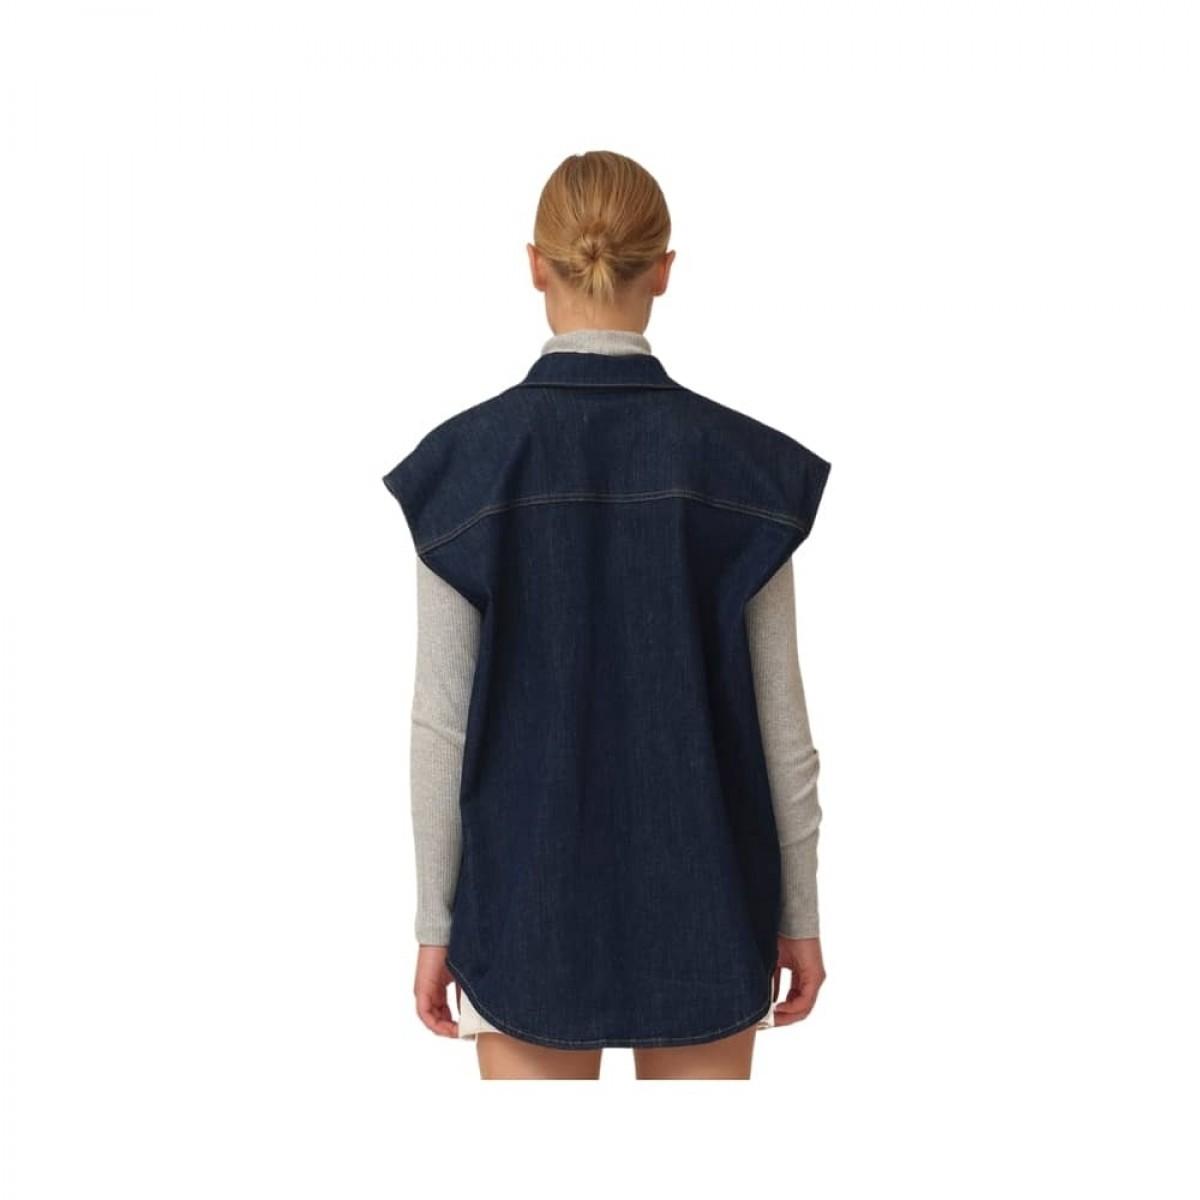 bowie oversize sl. less shirt - denim blue - model ryg